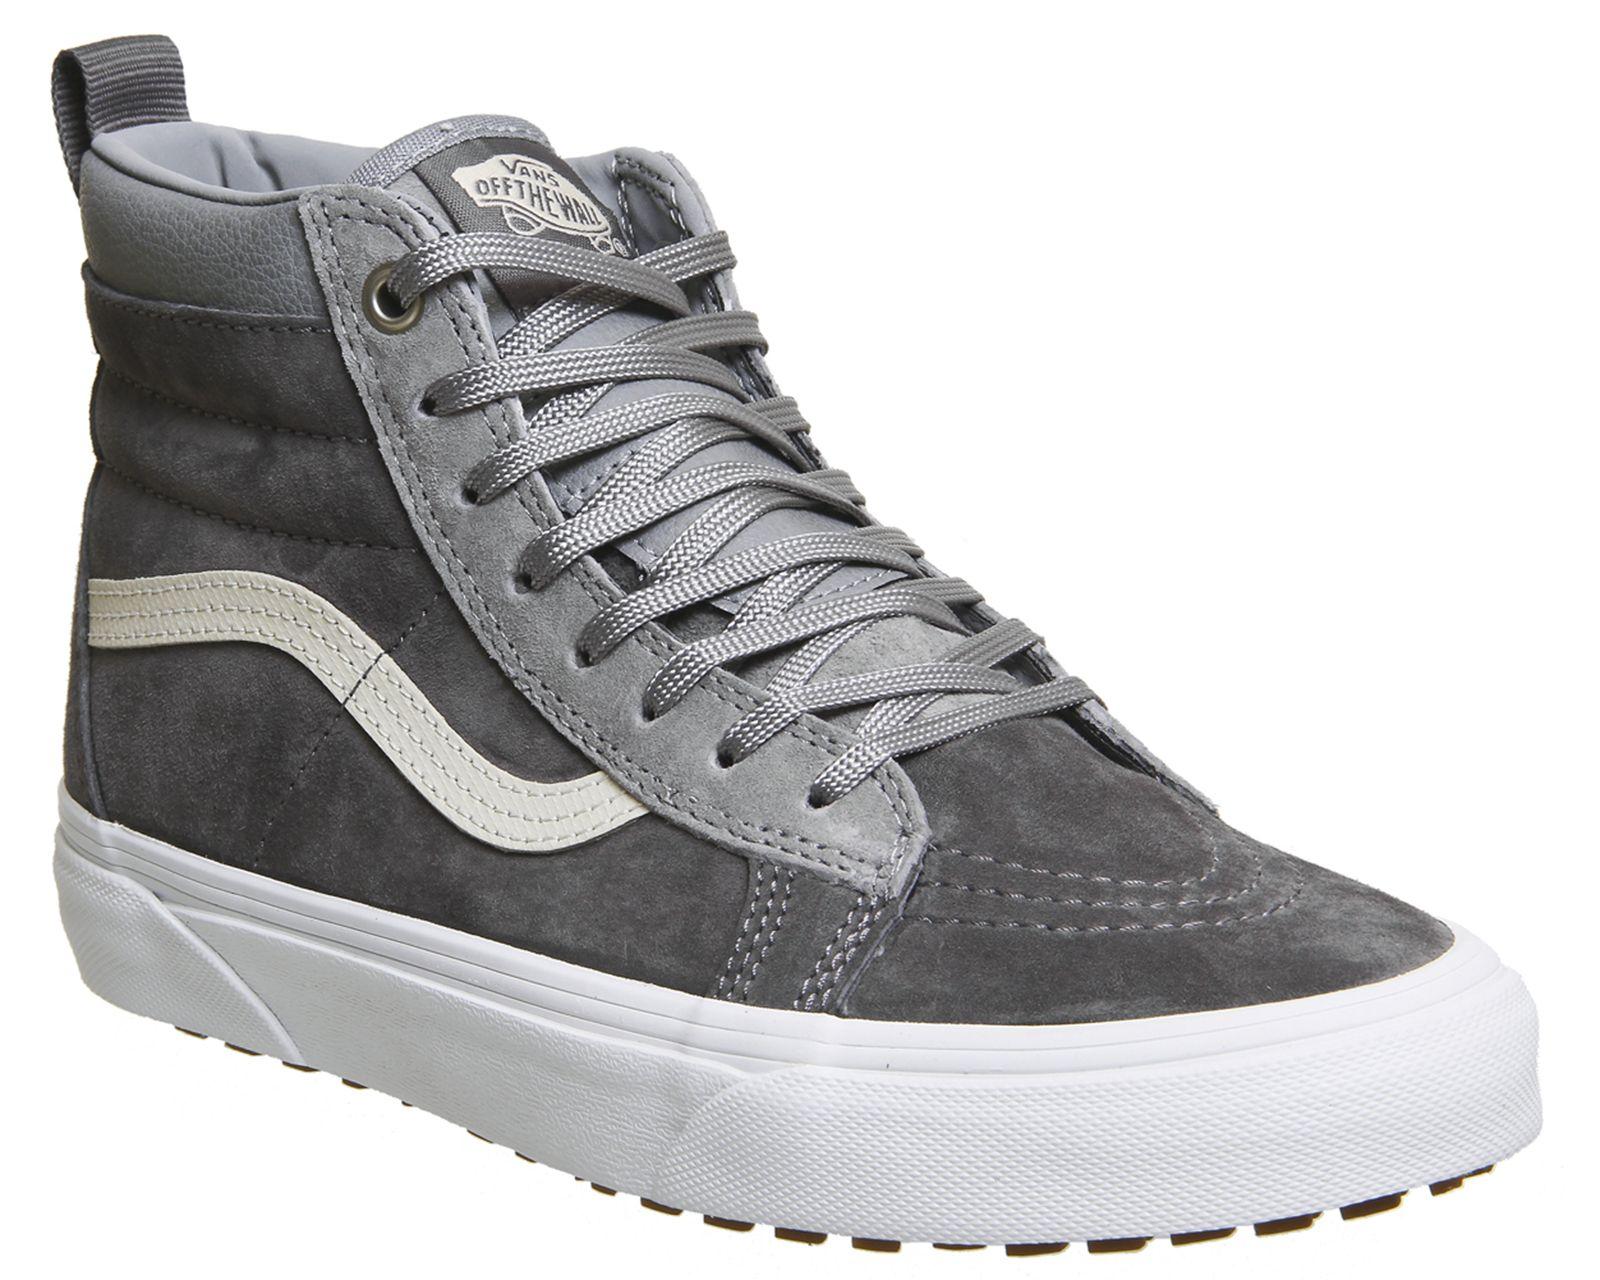 Sk8 Hi Mte | Vans sk8, Vans, High top sneakers